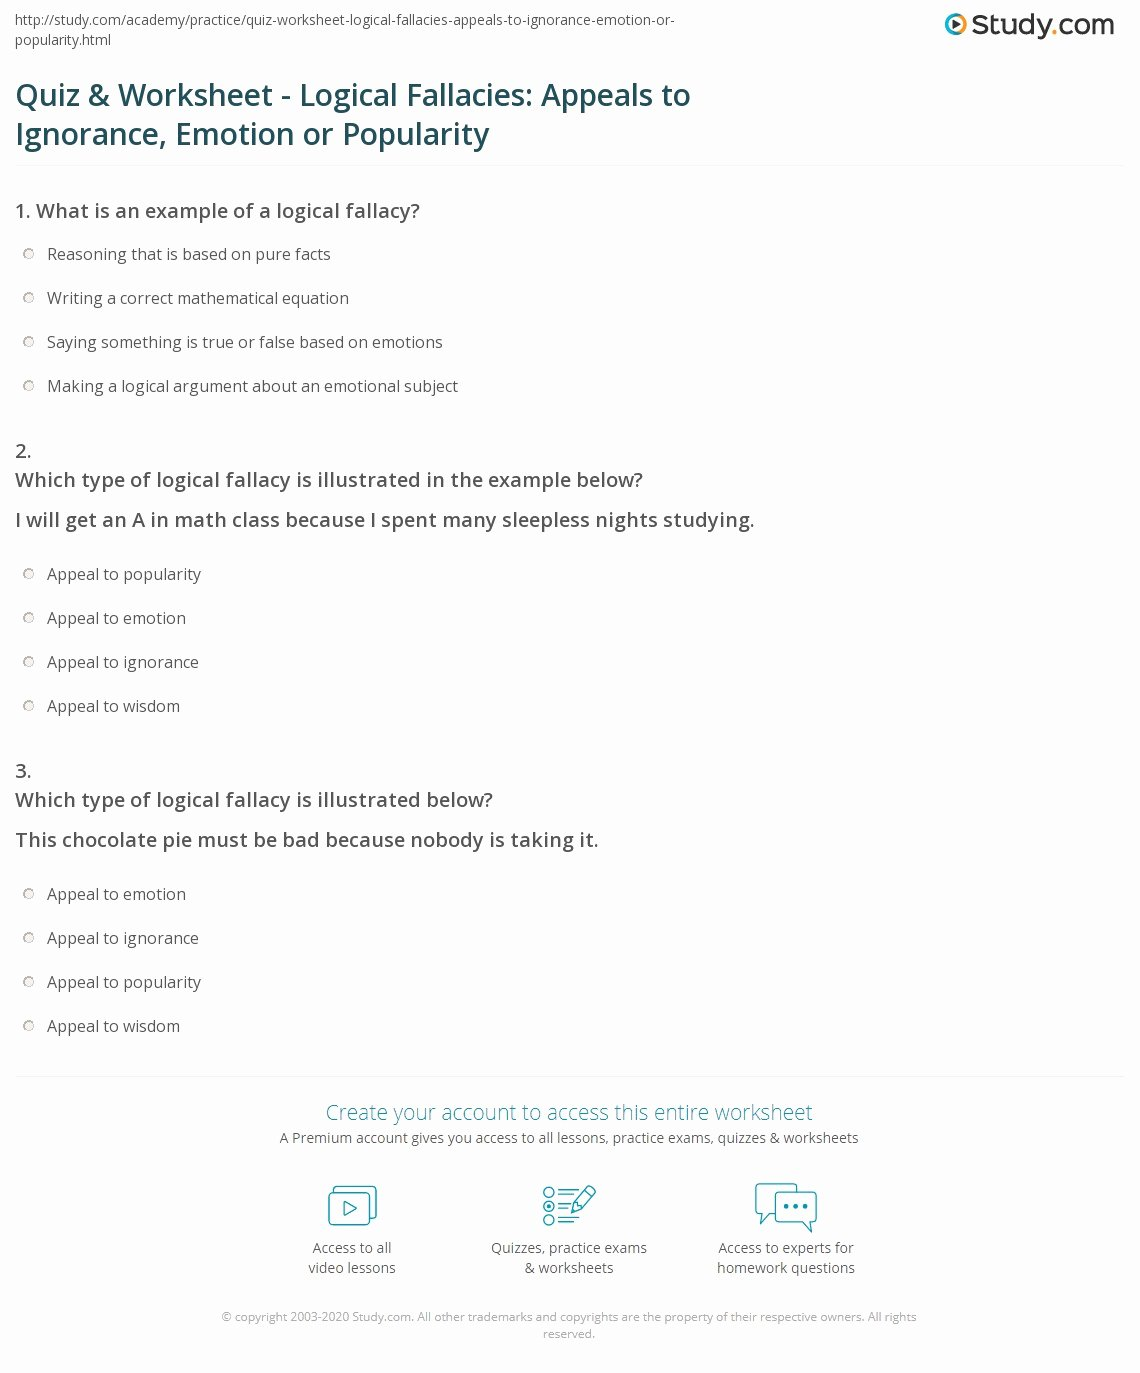 Logical Fallacies Worksheets High School Best Of Quiz & Worksheet Logical Fallacies Appeals to Ignorance